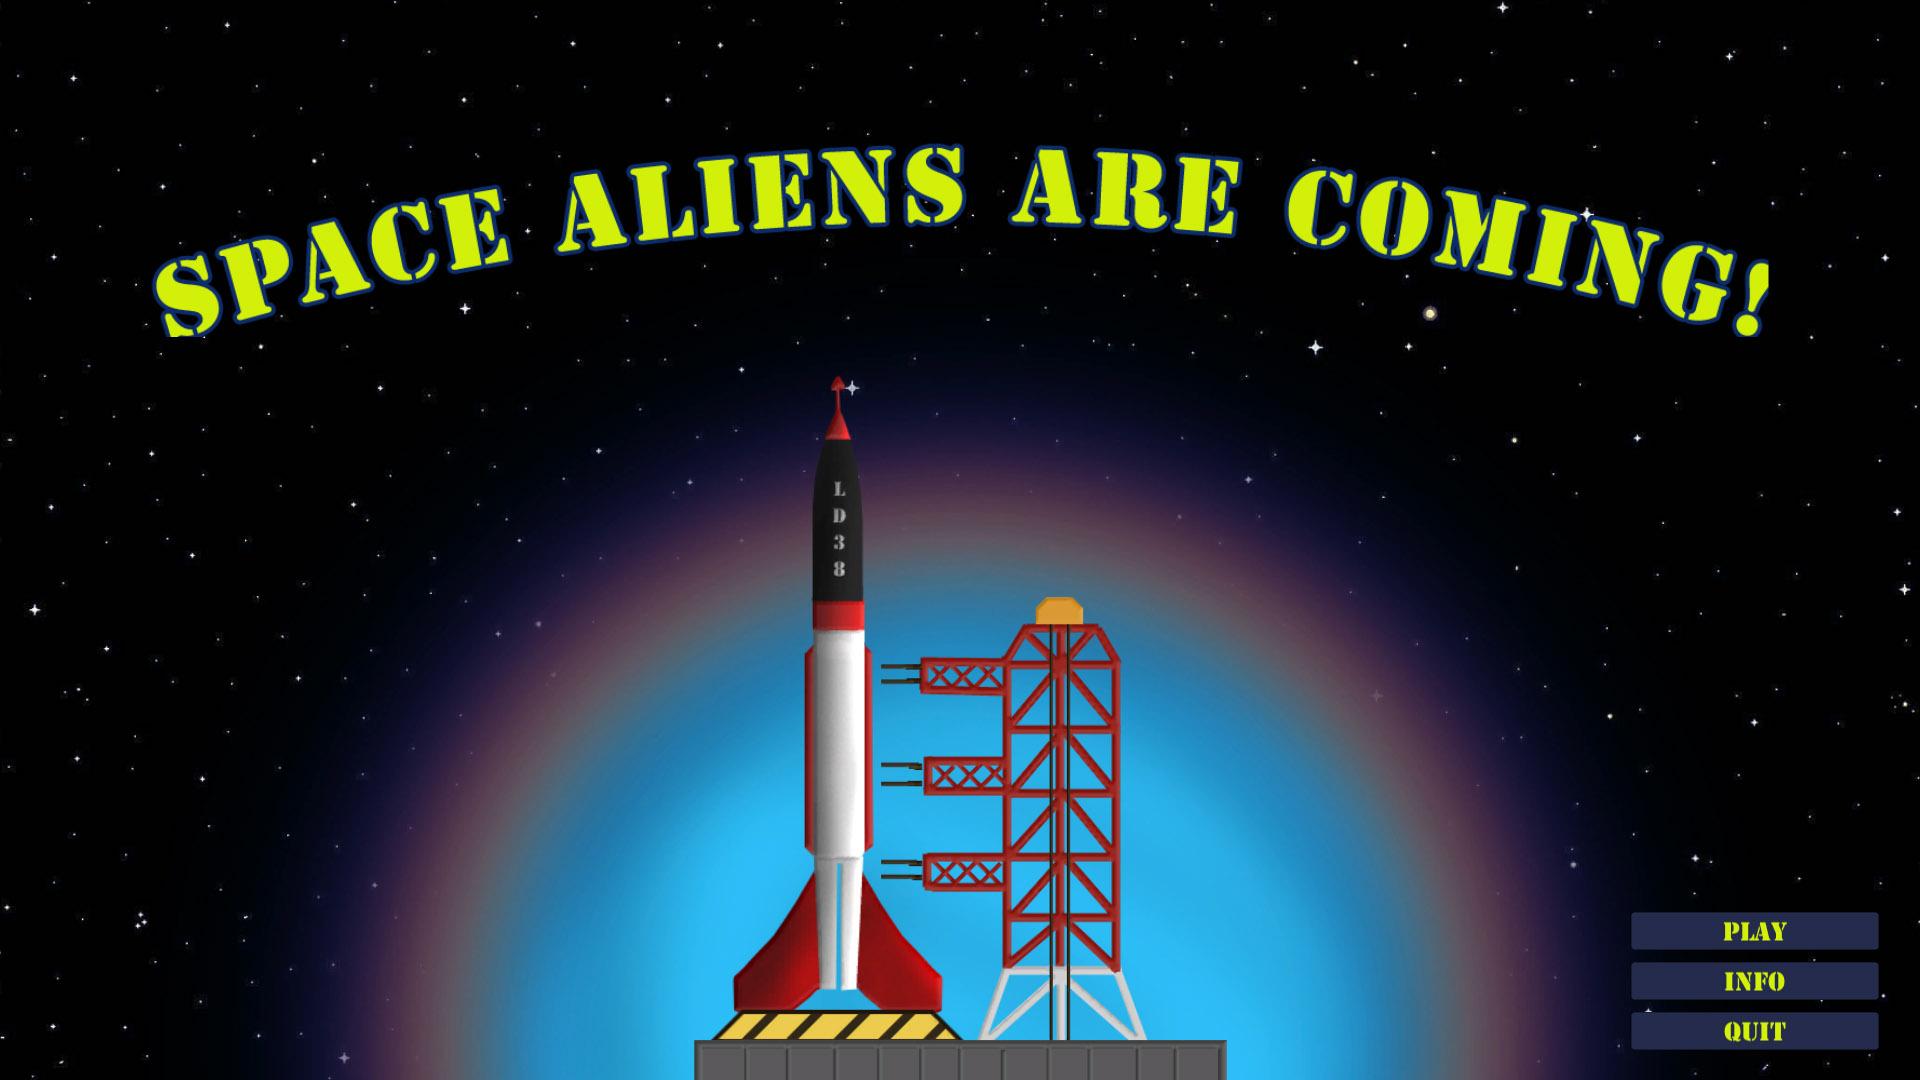 space aliens are coming ldjam com